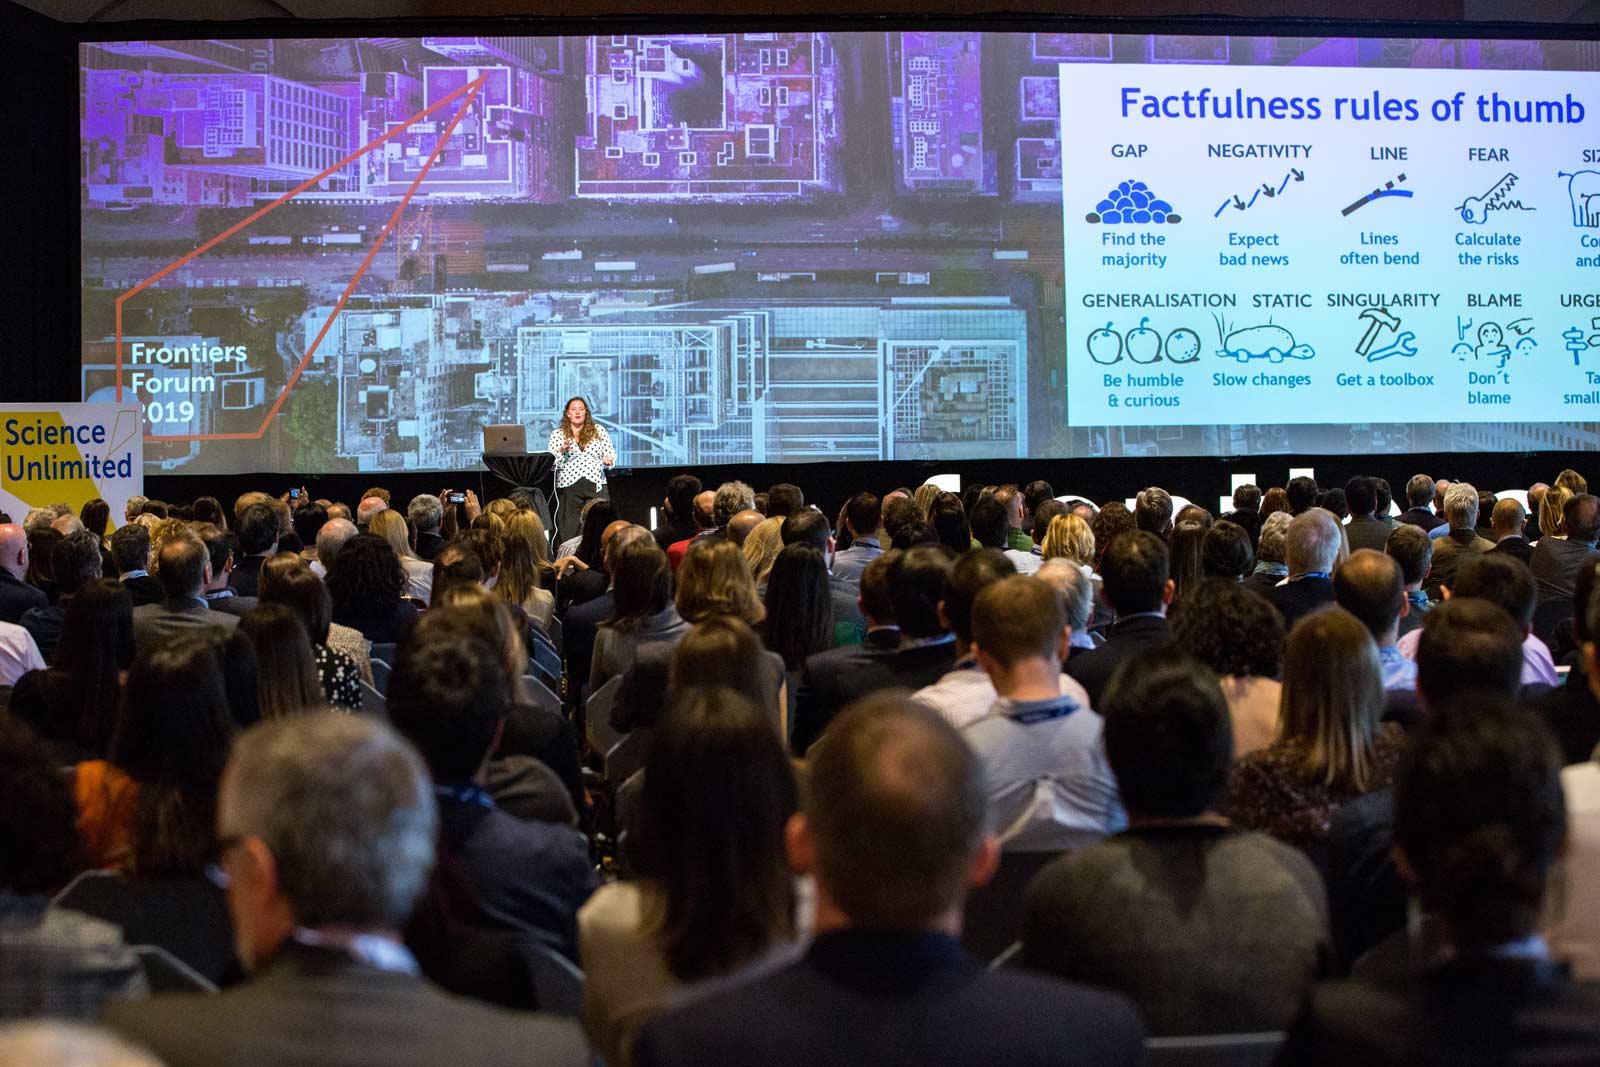 frontiers-forum-science-unlimited-2019-8.jpg